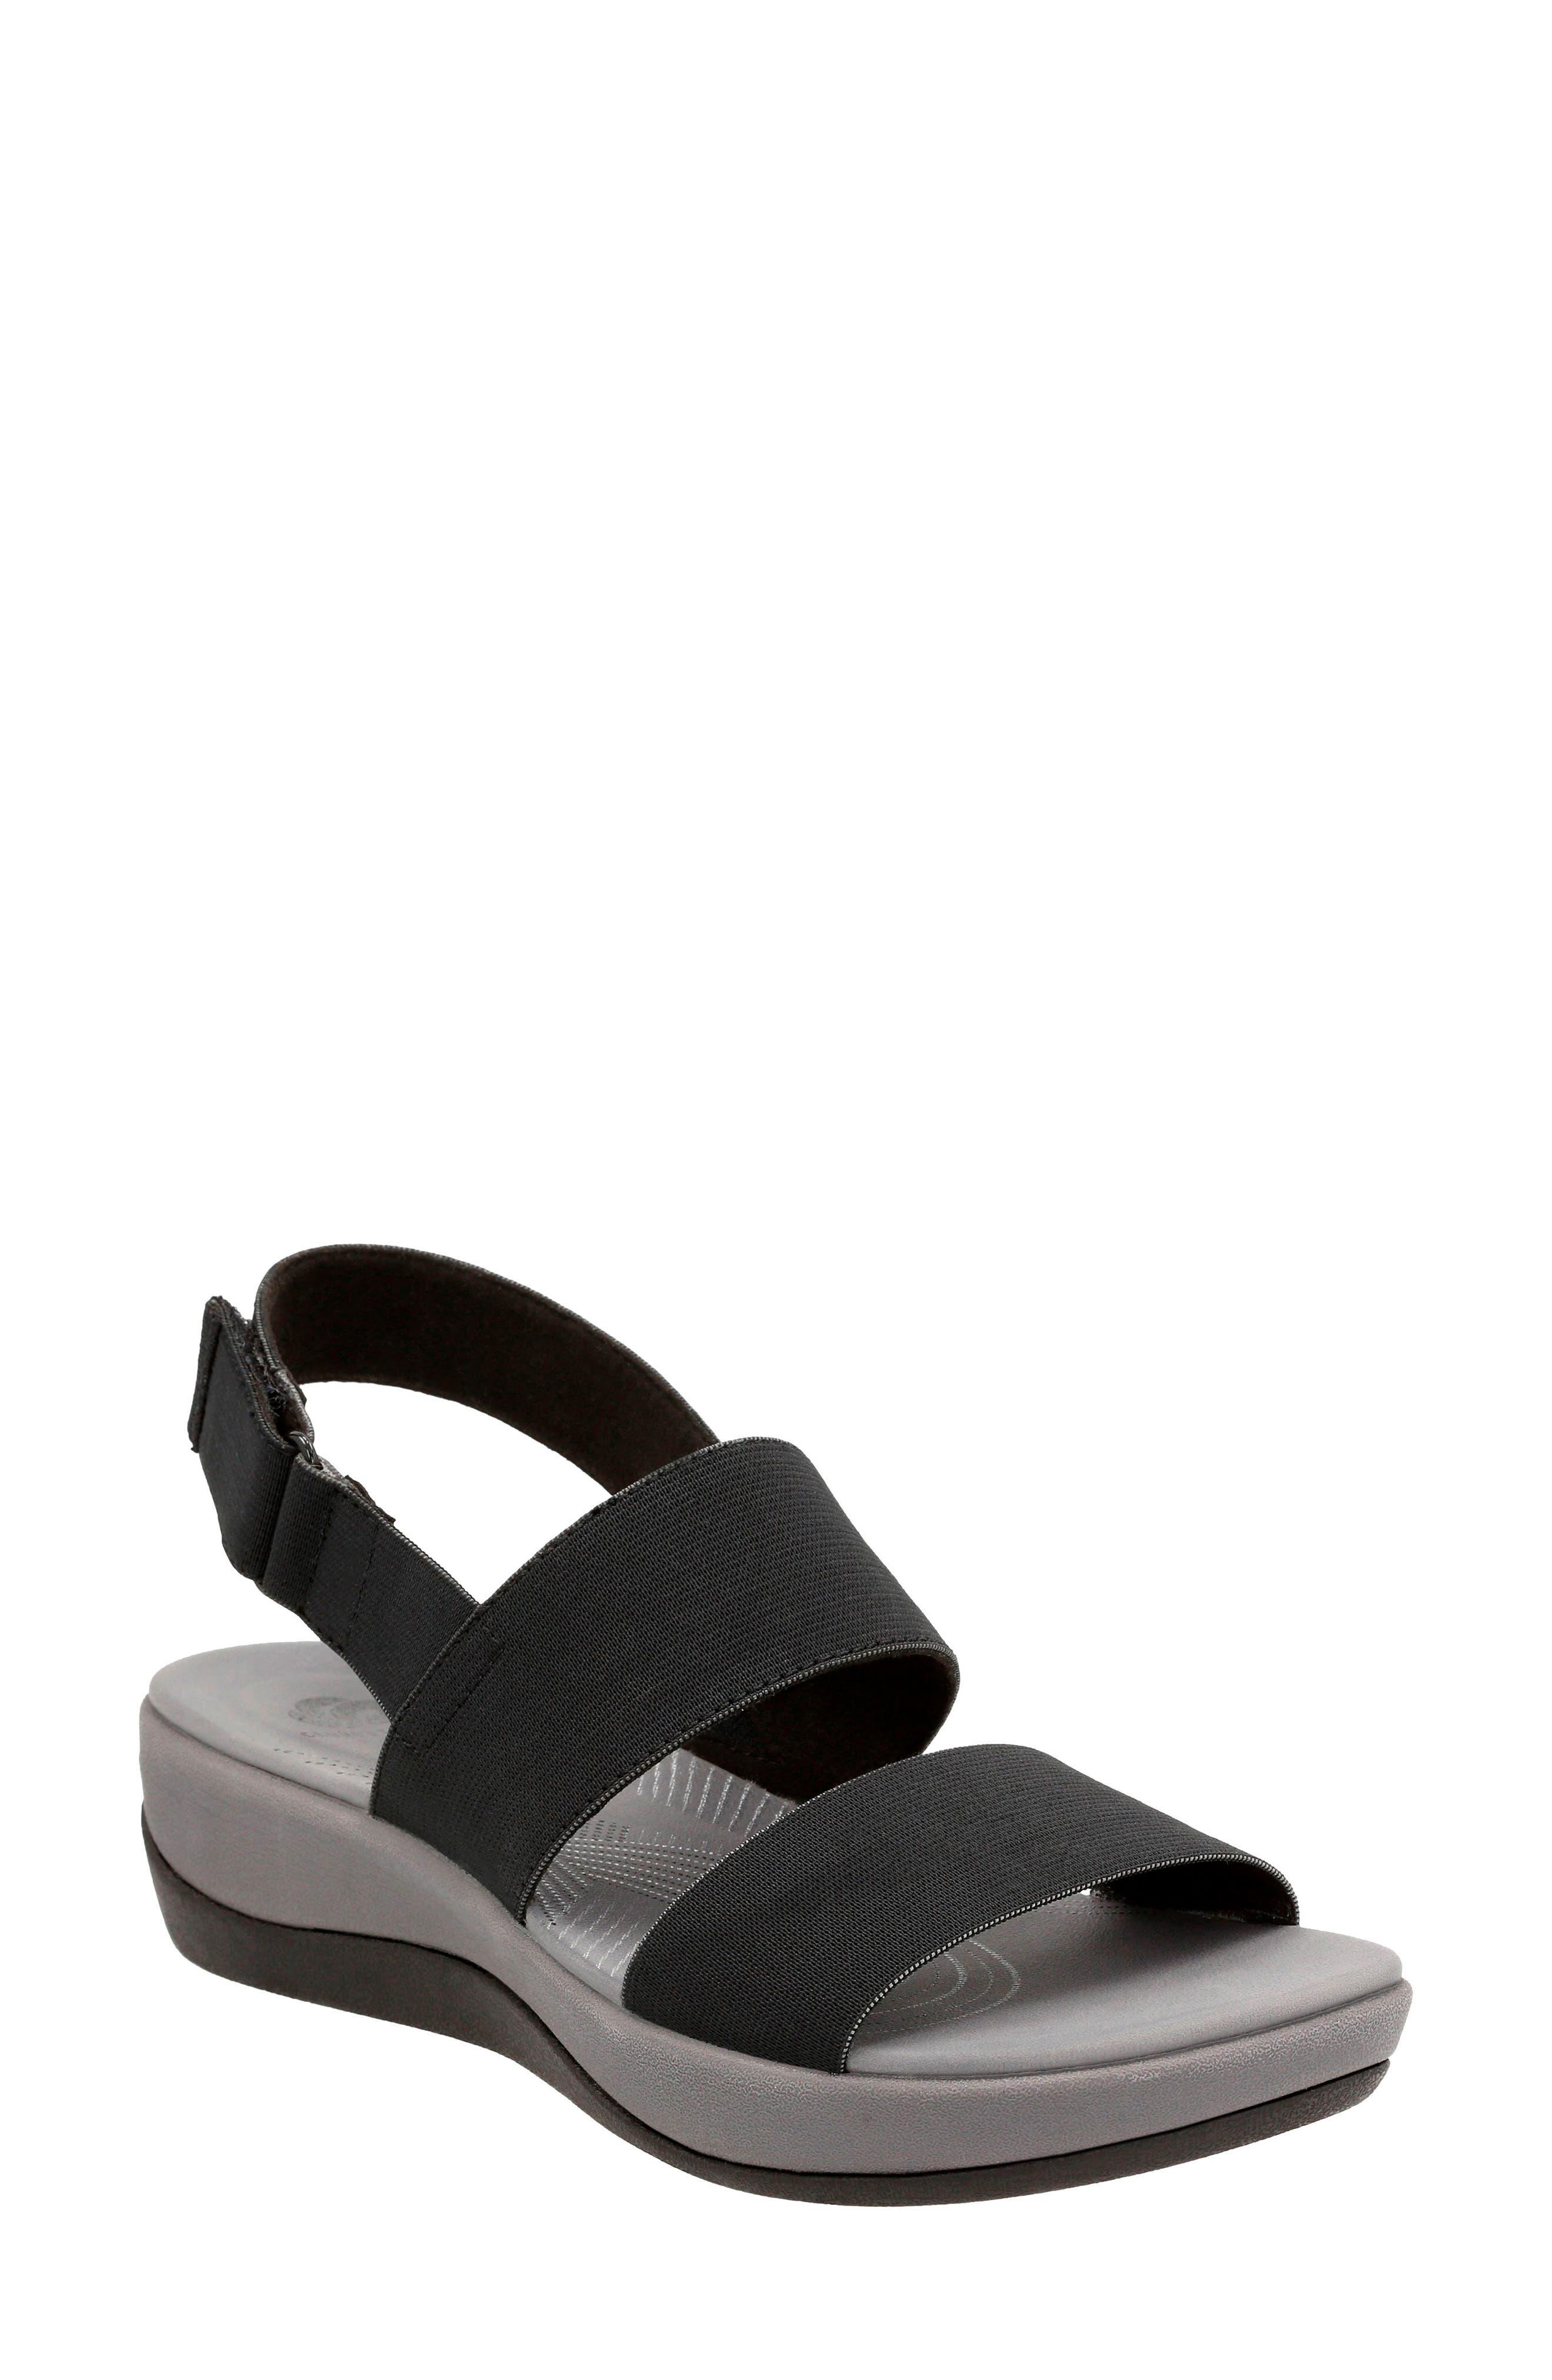 Arla Jacory Sandal,                         Main,                         color, Black Solid Fabric